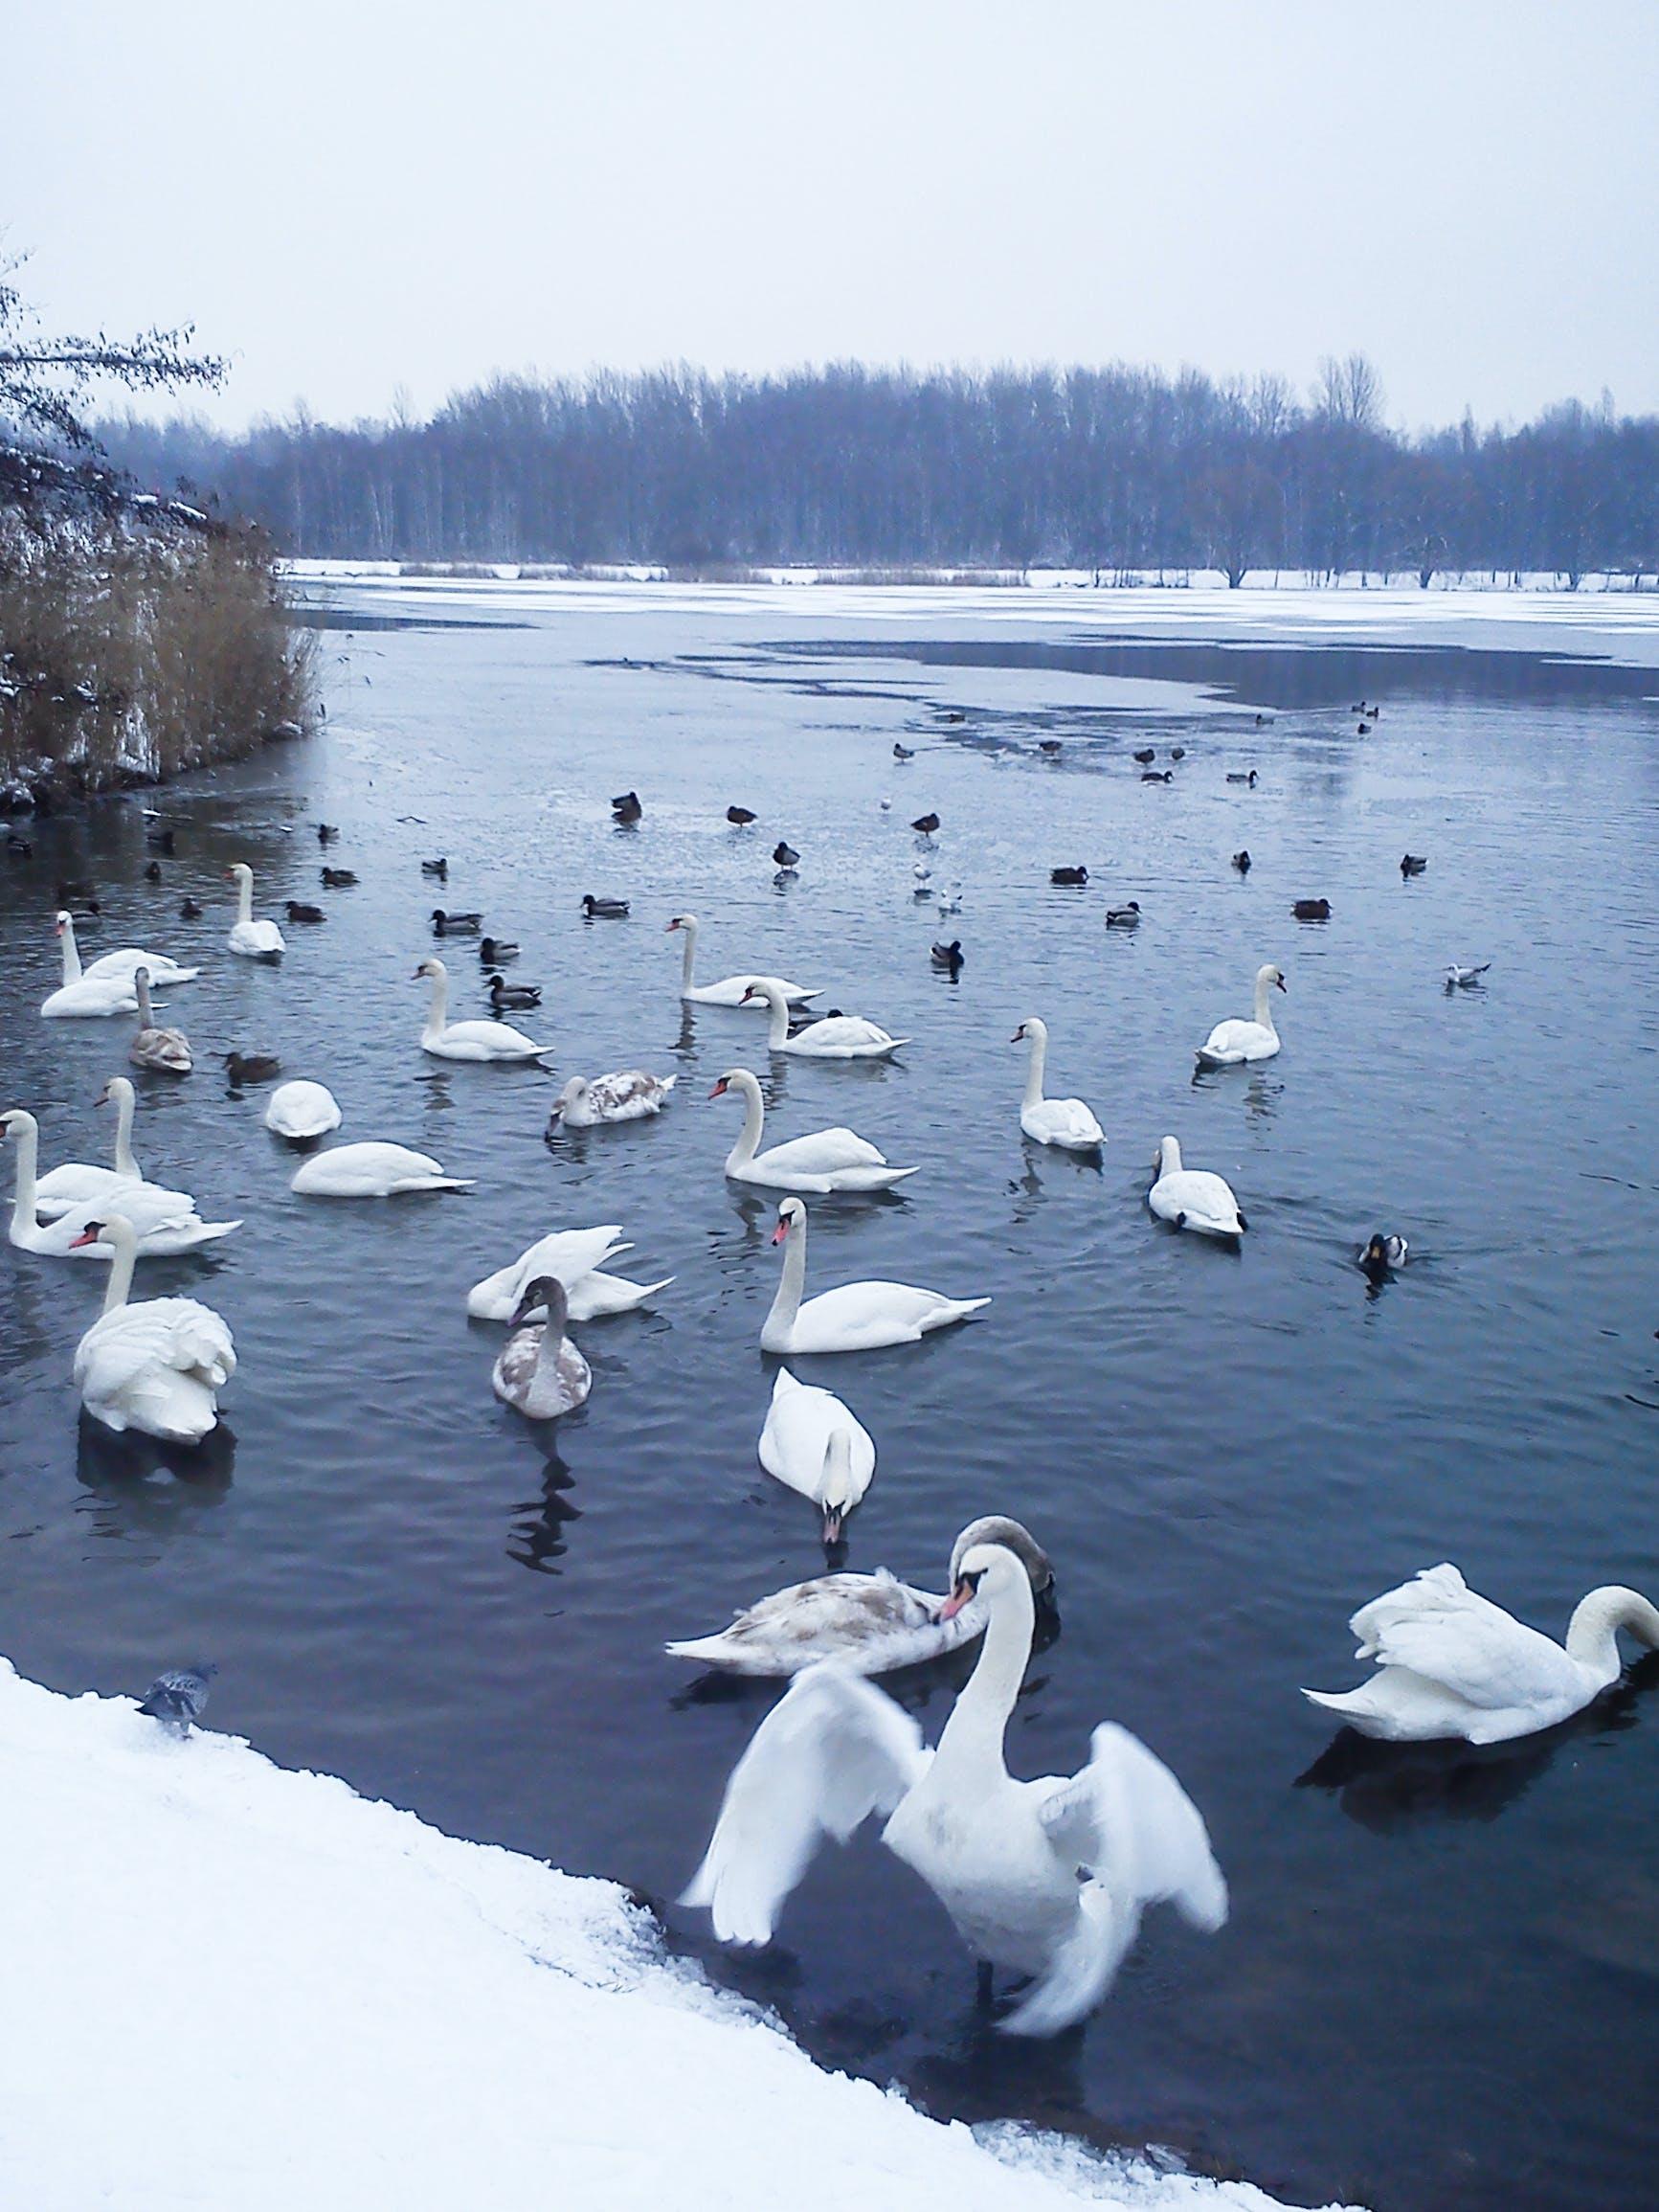 Free stock photo of lake, swan, duck, walk